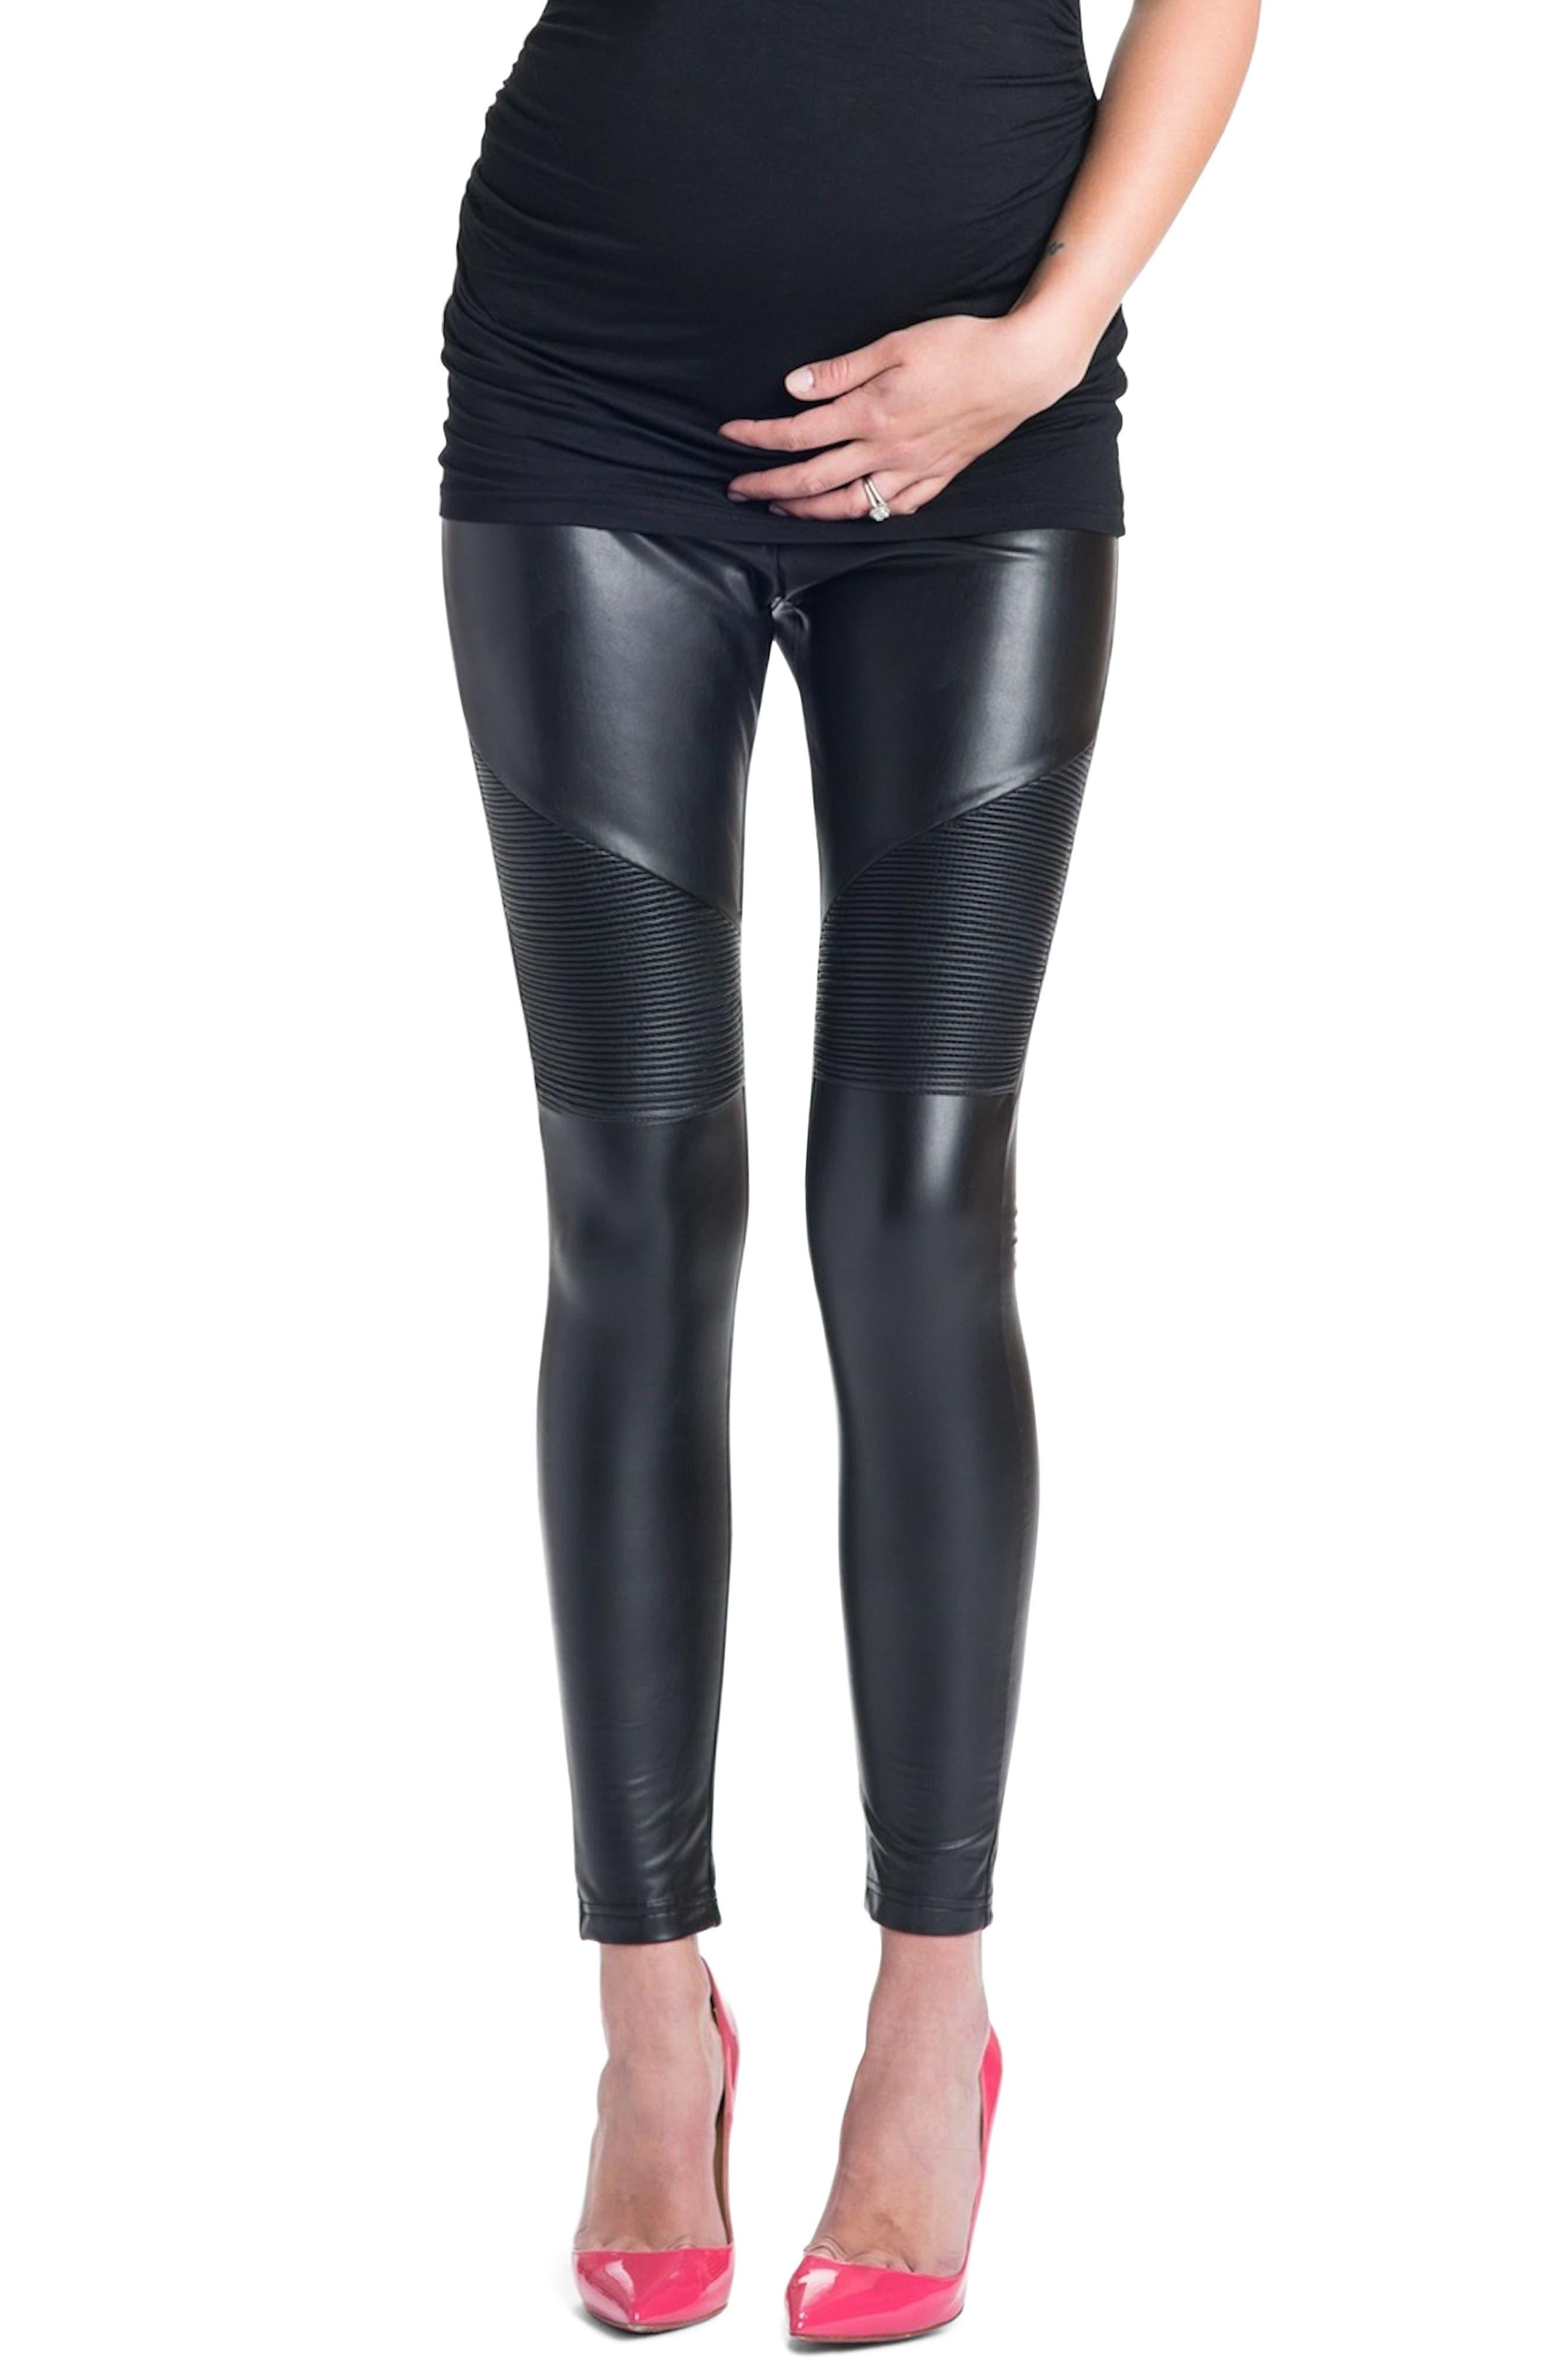 Rockstar Mamacita Maternity Moto Leggings,                             Main thumbnail 1, color,                             BLACK